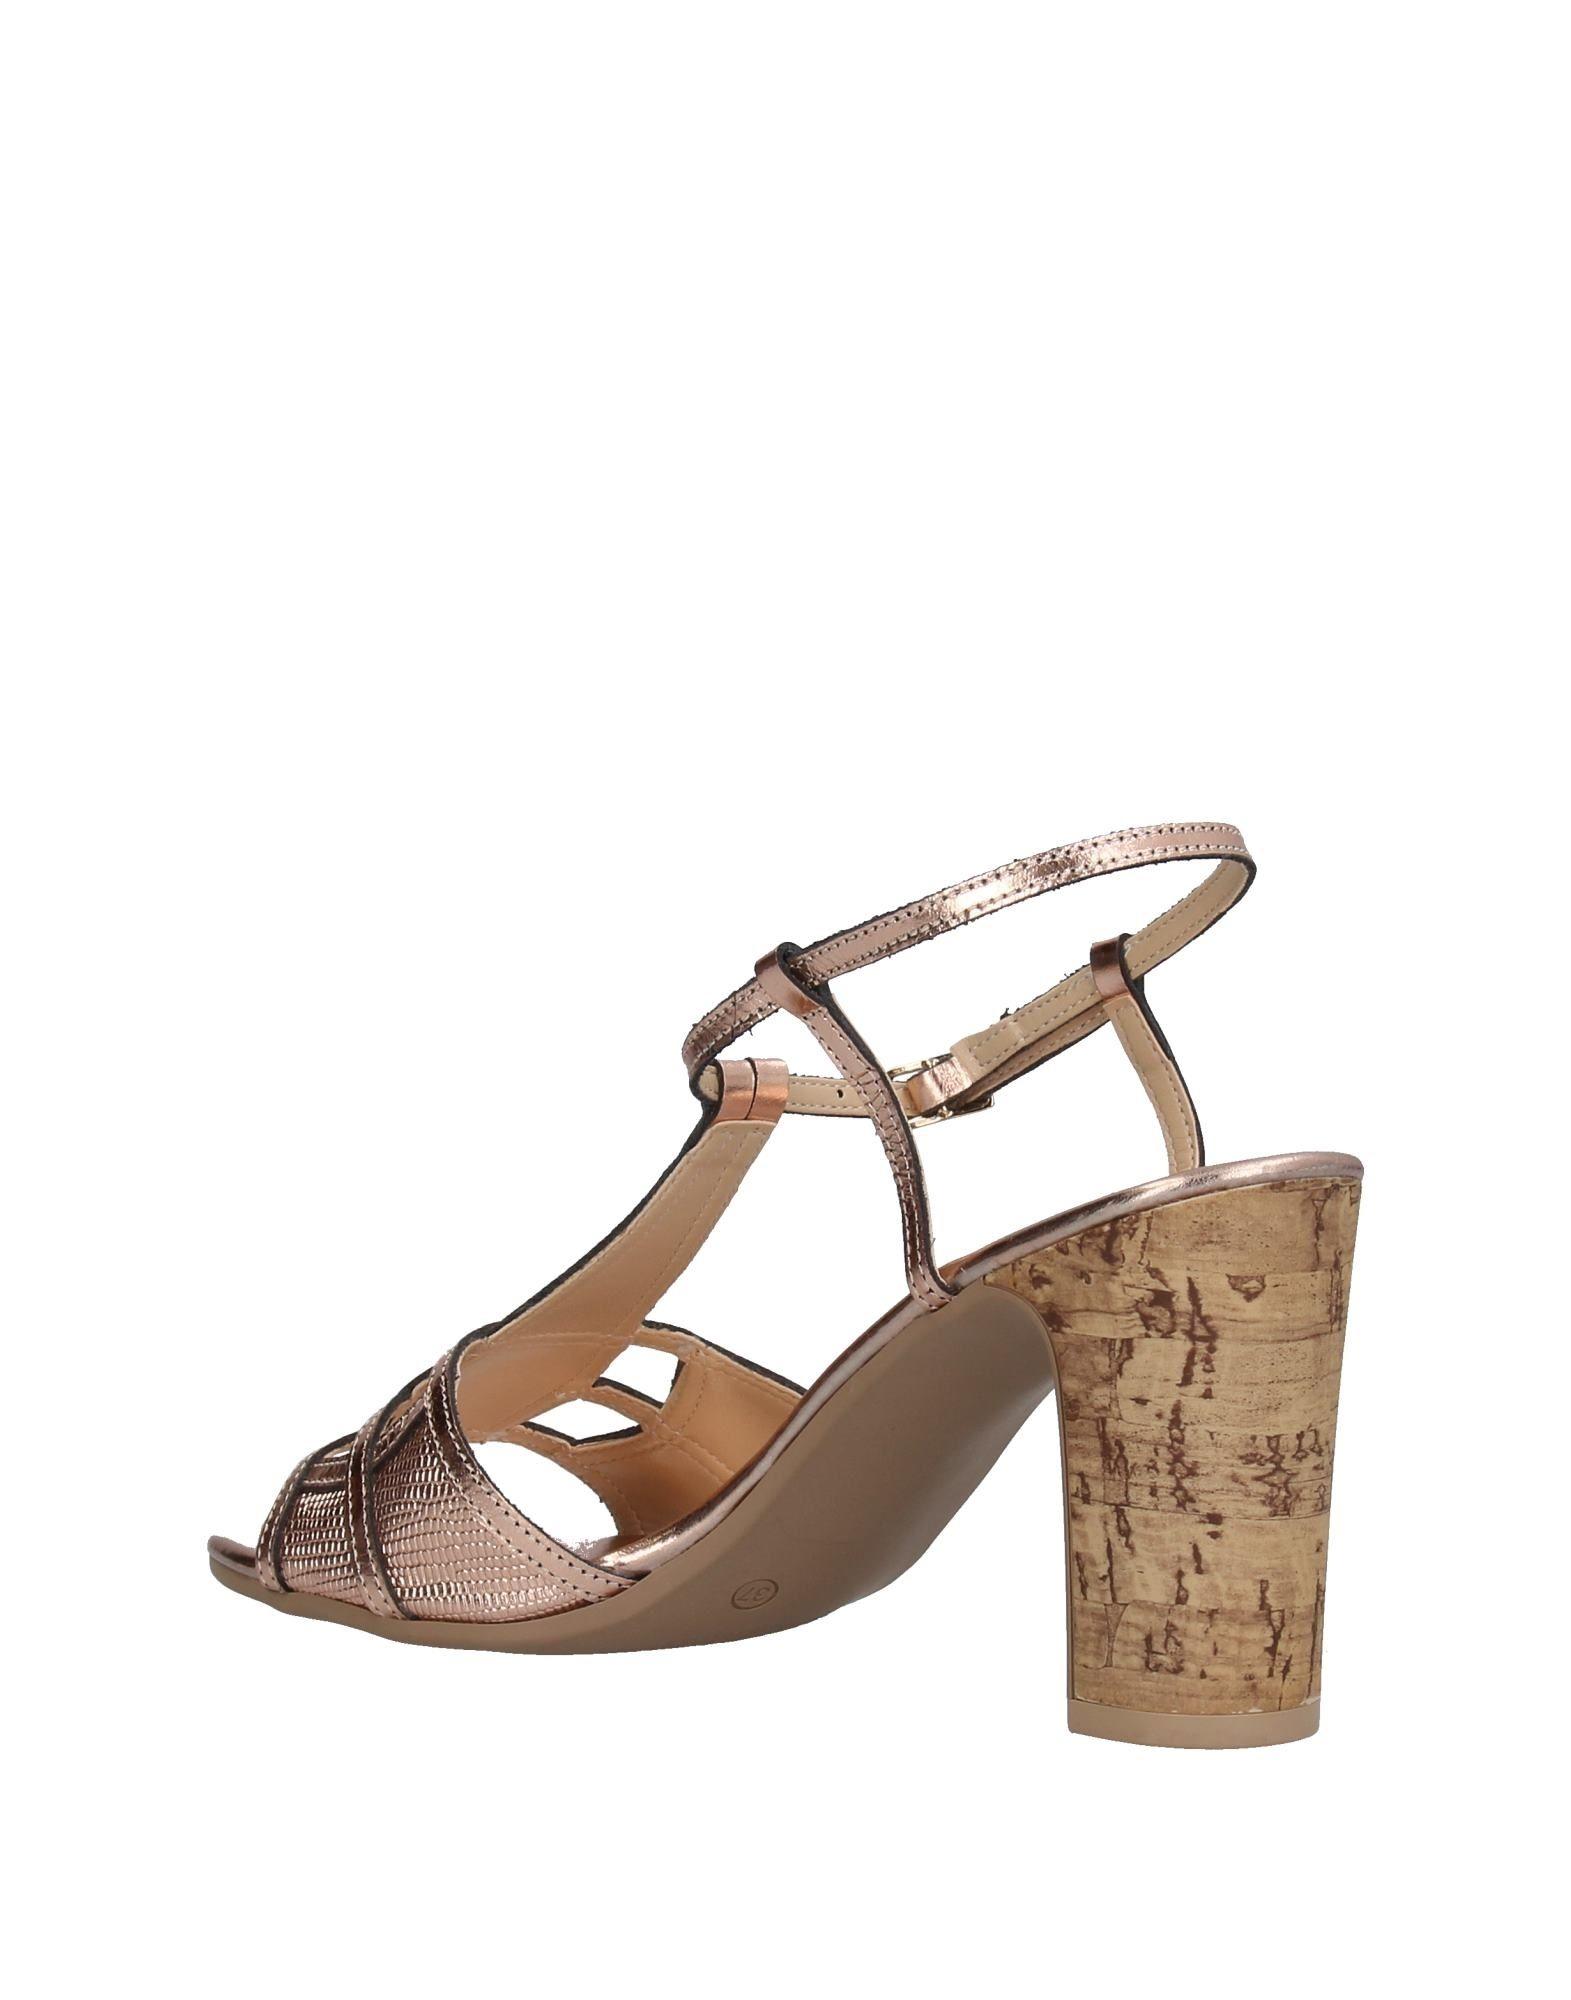 Nila Nila & Nila Nila Sandalen Damen  11351510UG Neue Schuhe 8321d5